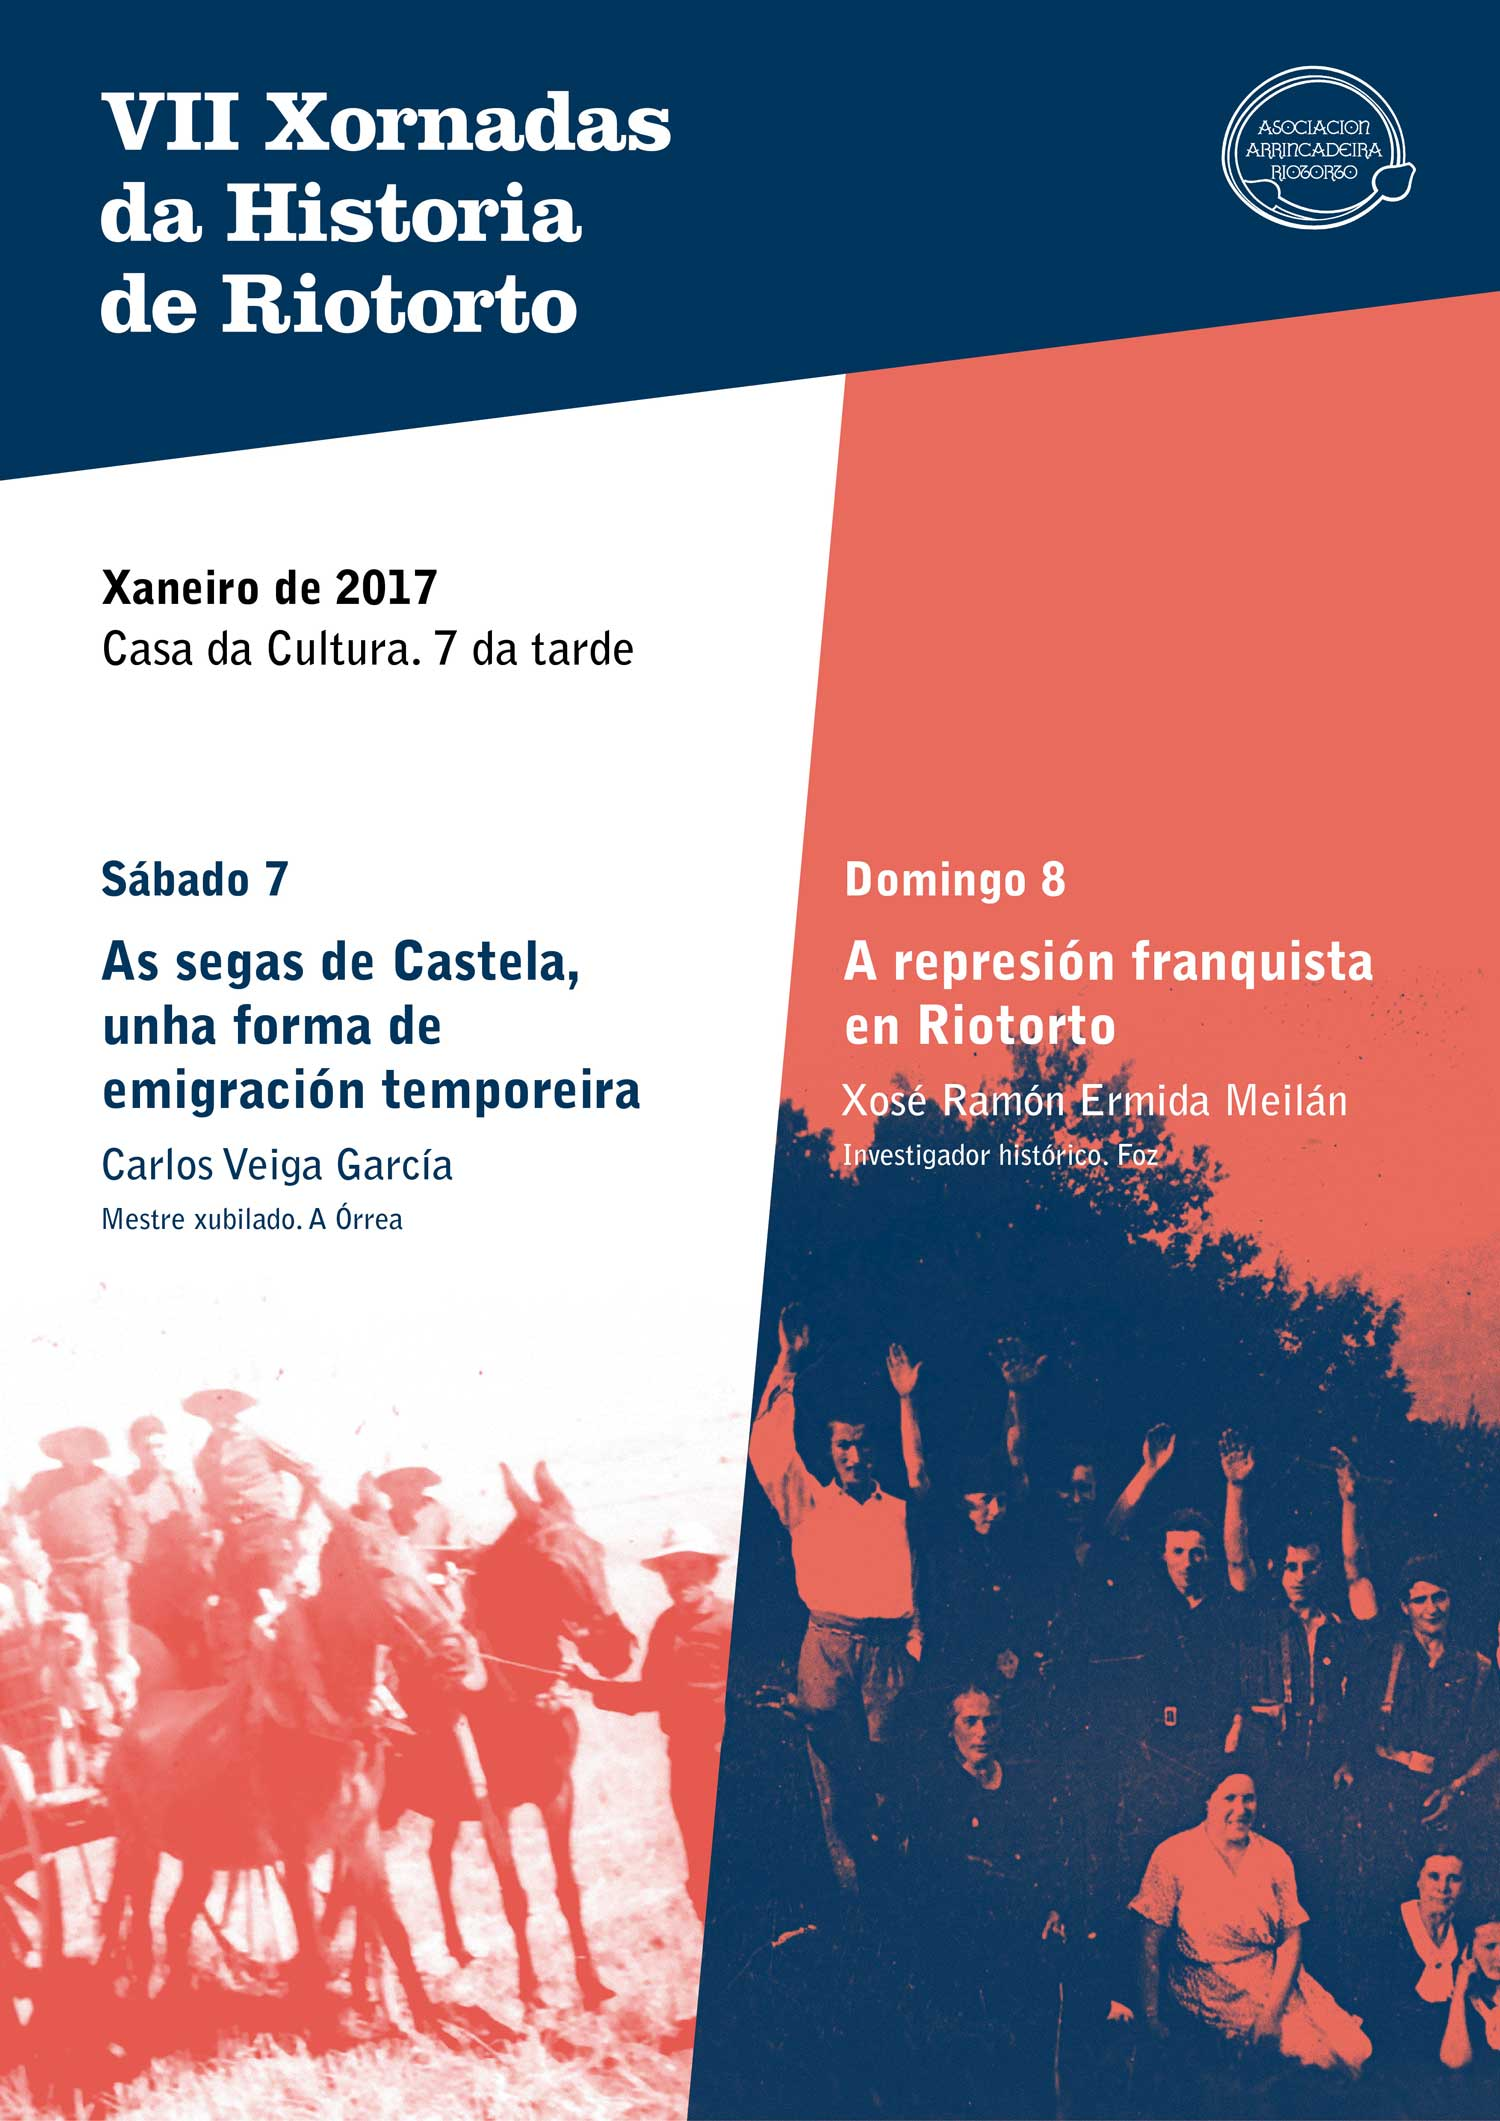 https://amigosdopatrimoniodecastroverde.gal/wp-content/uploads/sites/19/2017/01/Cartaz_VII_Xornadas.jpg